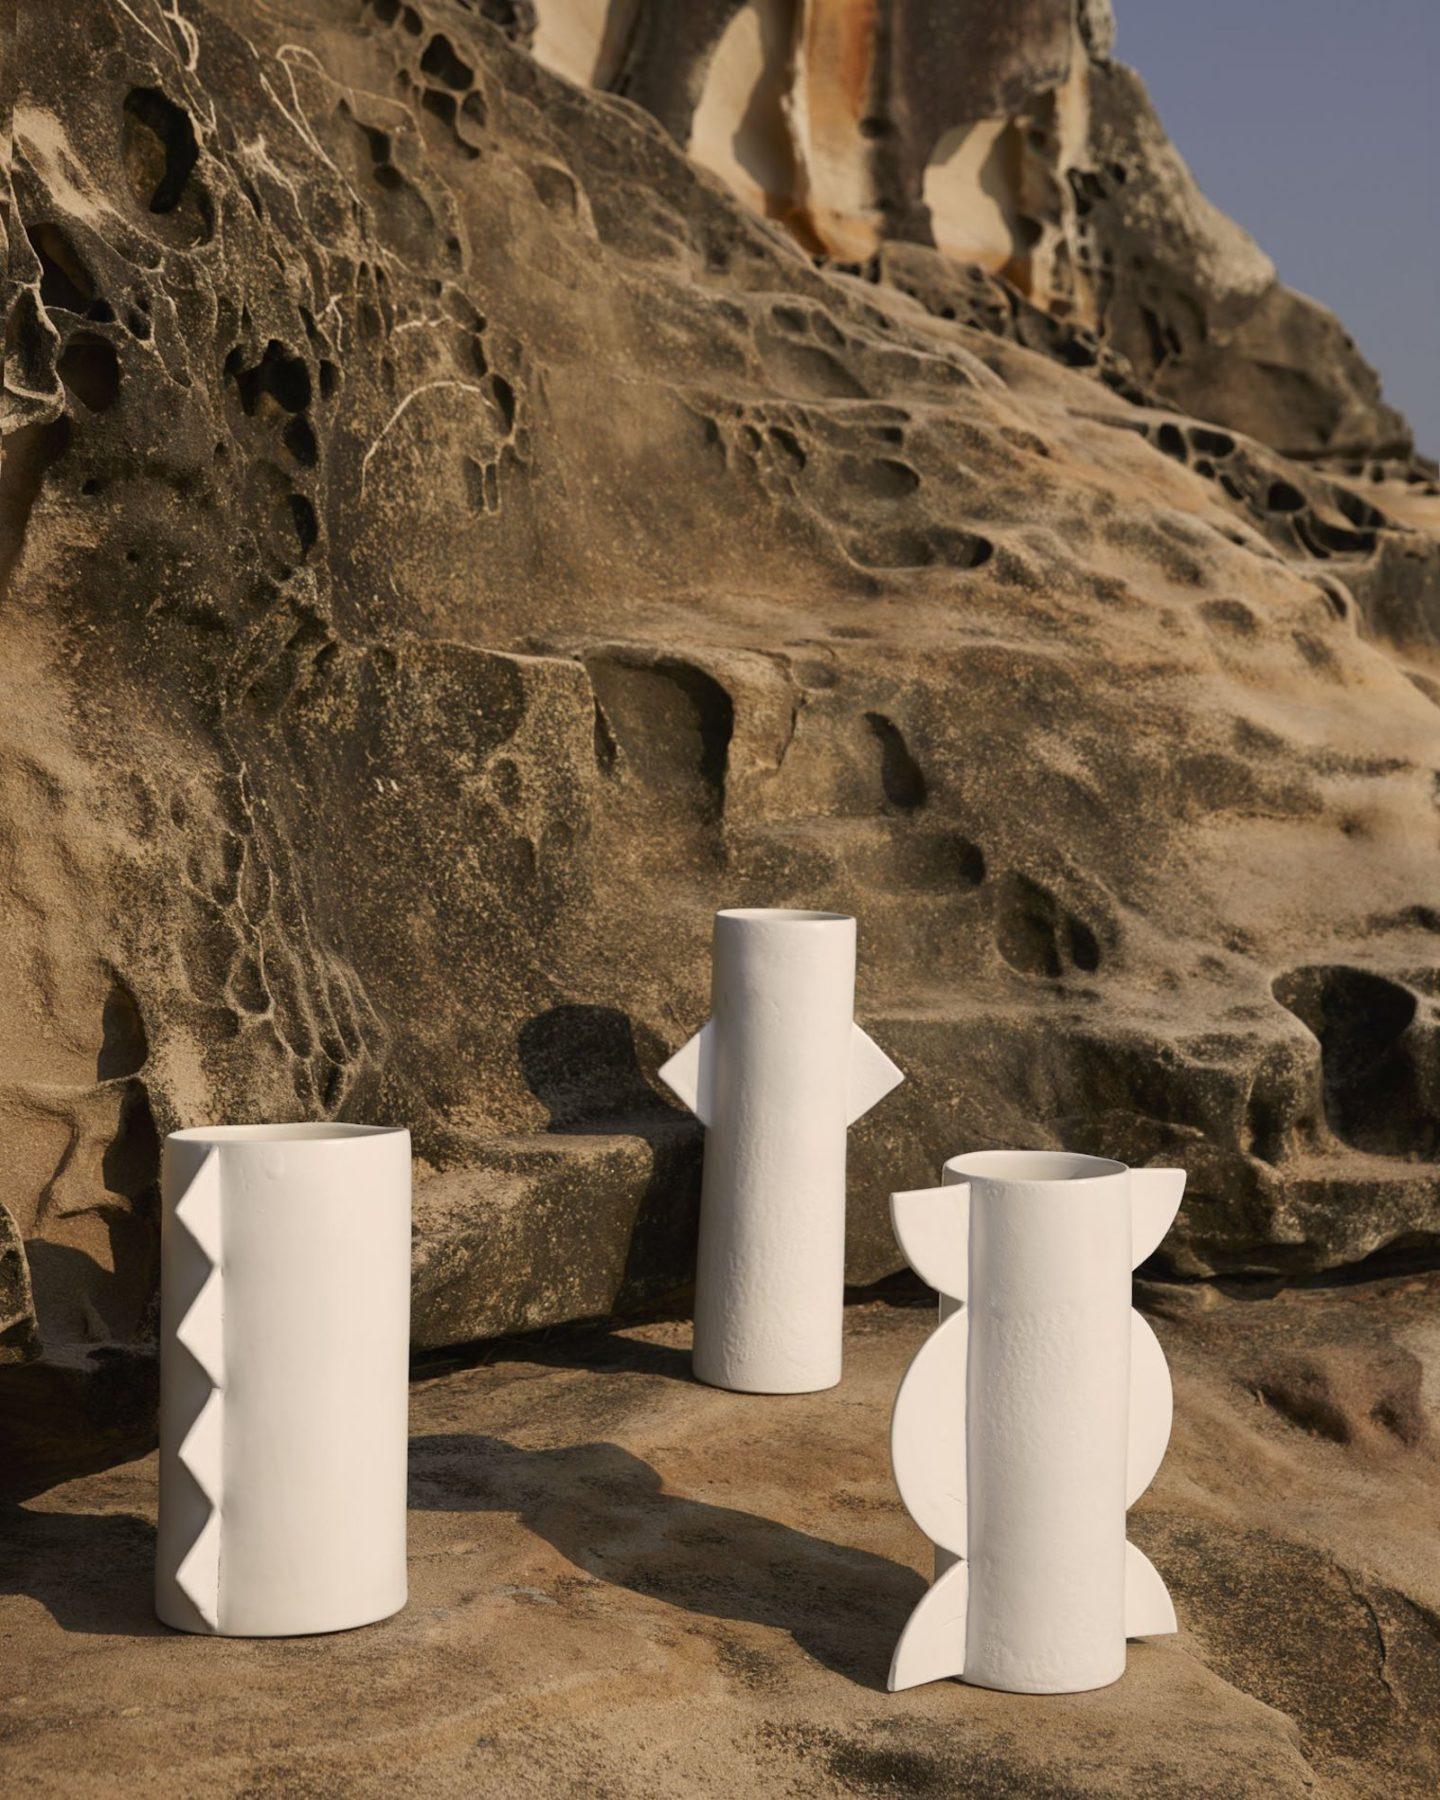 ignant-design-sarah-ellison-the-new-wave-004-1440x1800